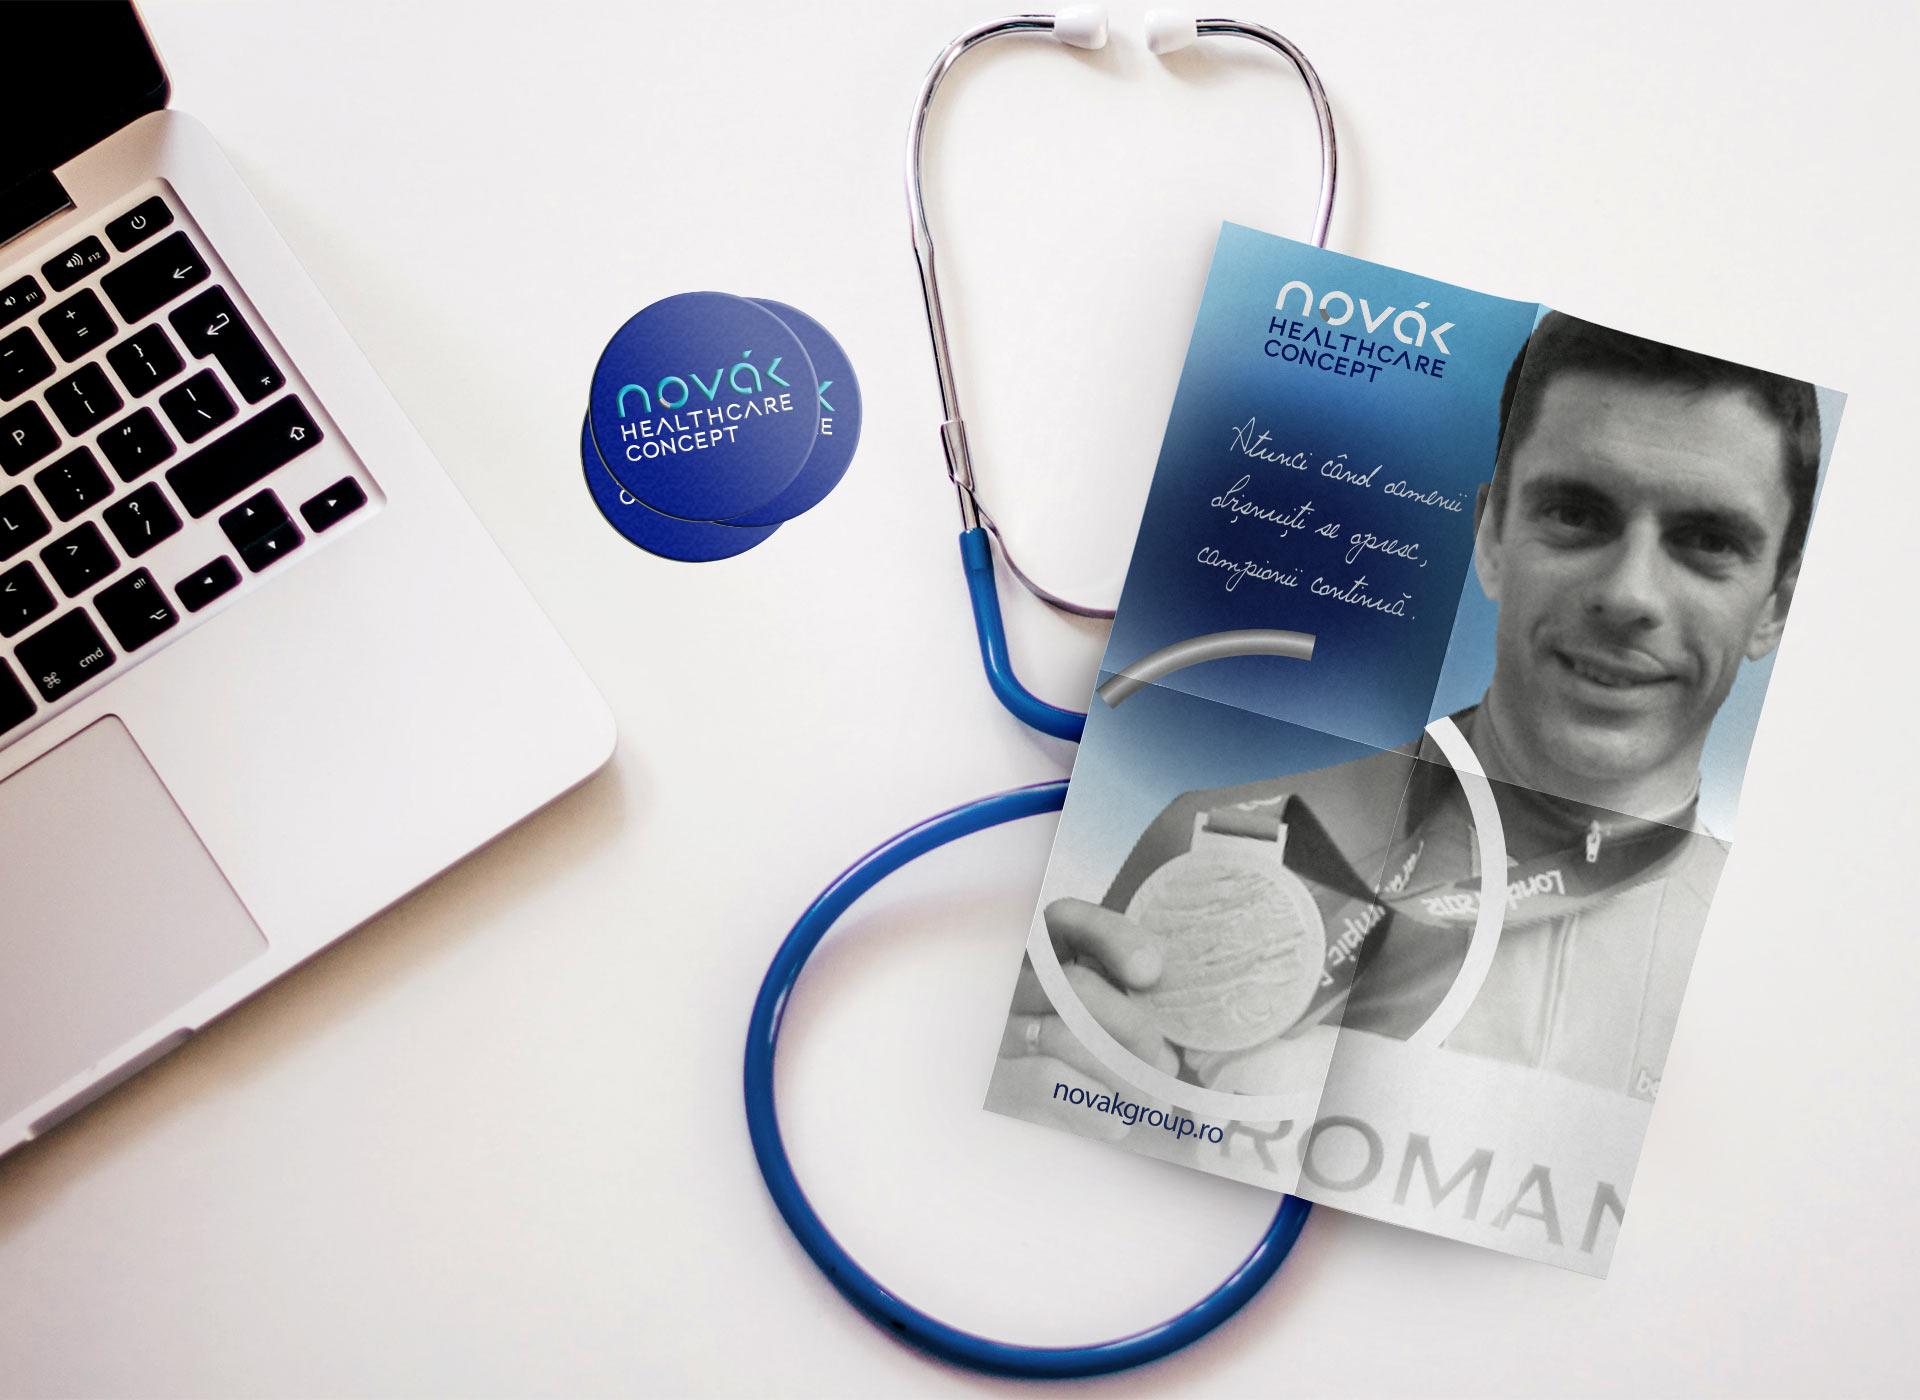 novak stetoscop branding